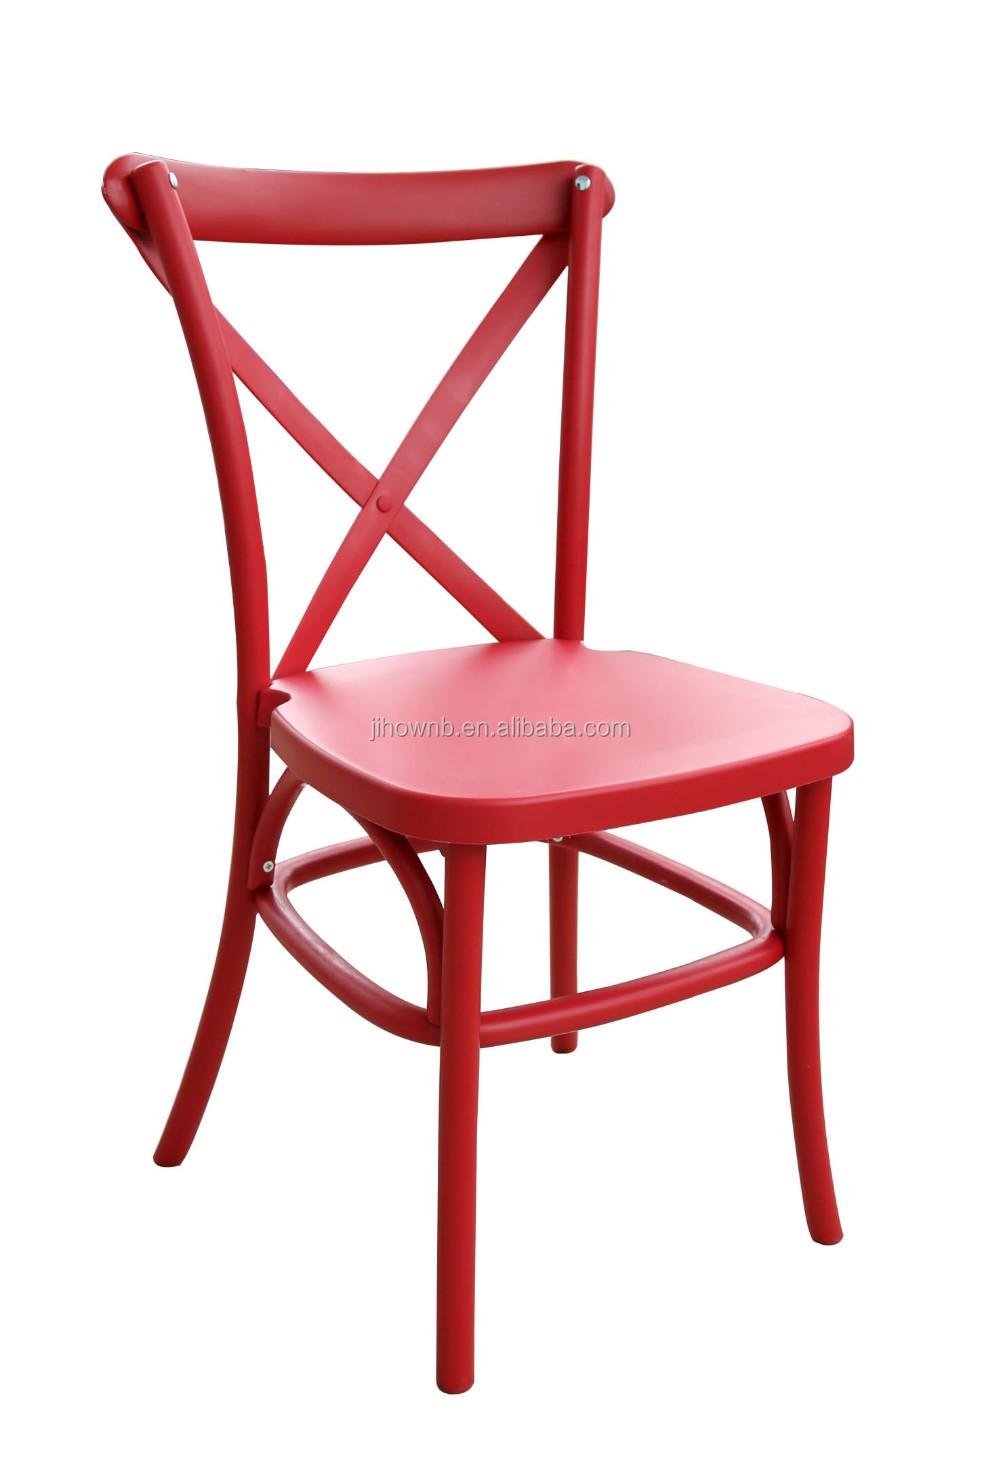 Factory Direct White Plastic Bistro Chair For Wedding Buy White Bistro Chai